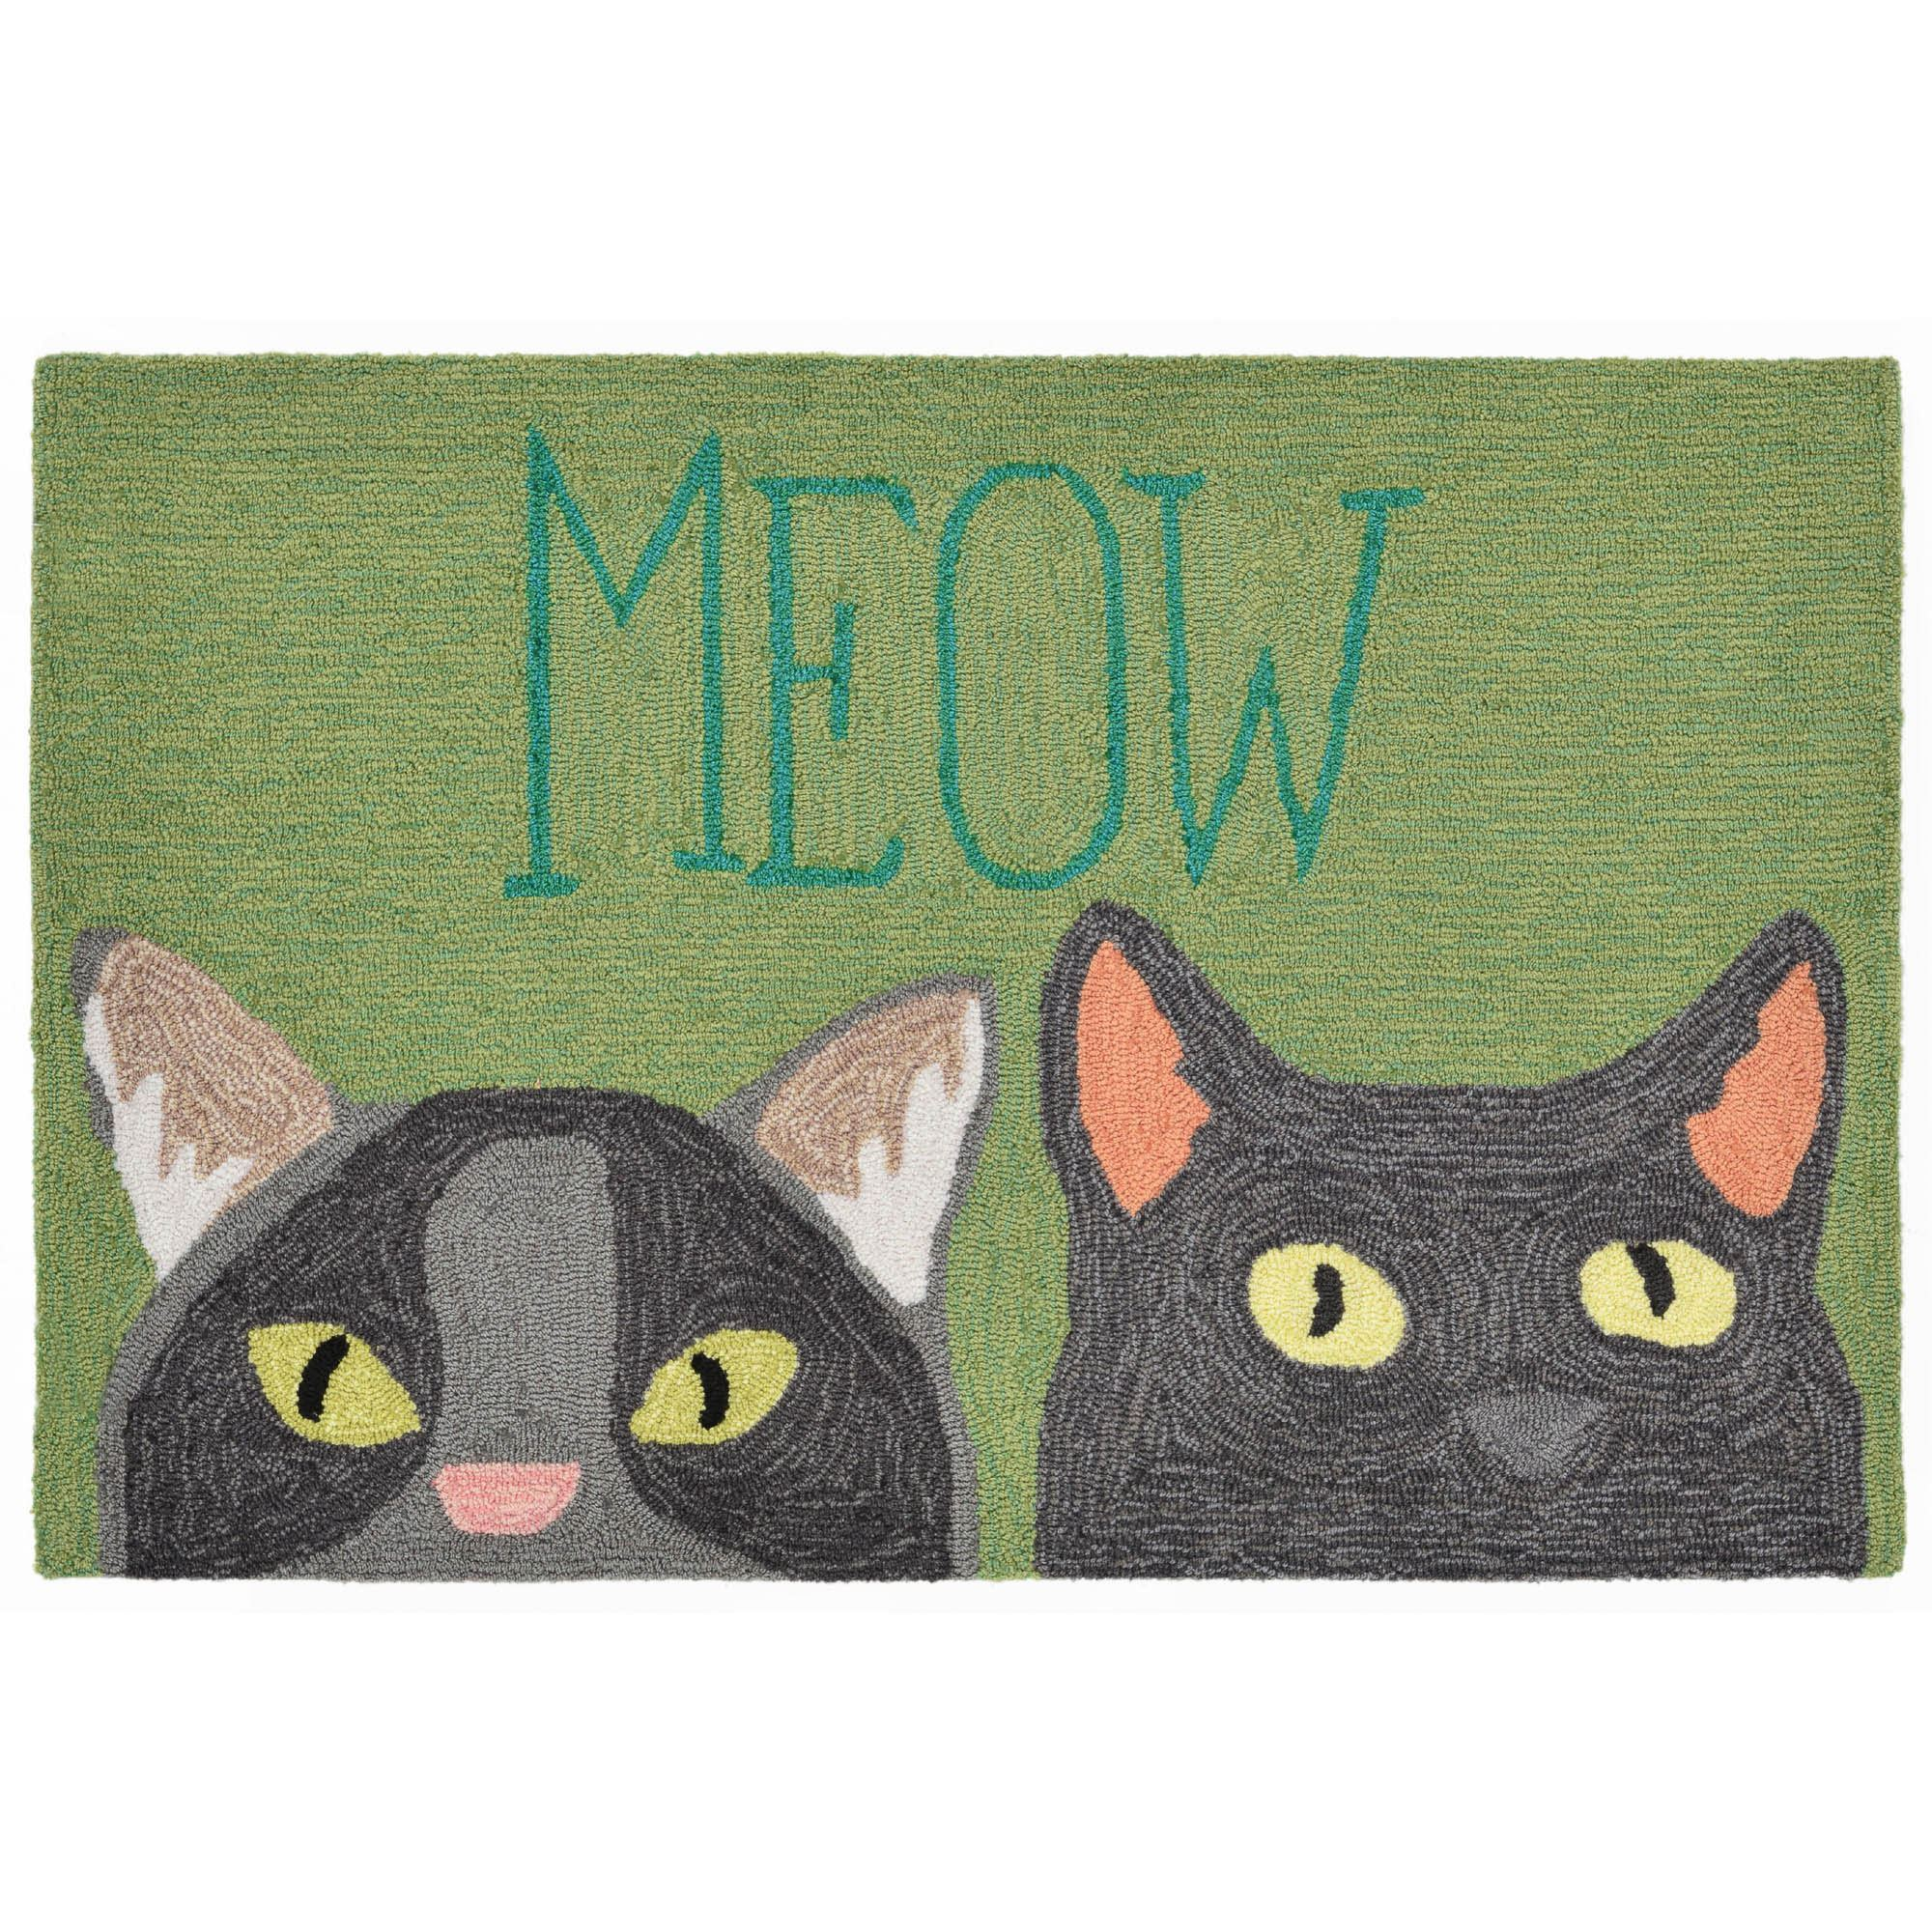 Meow Cat Mat